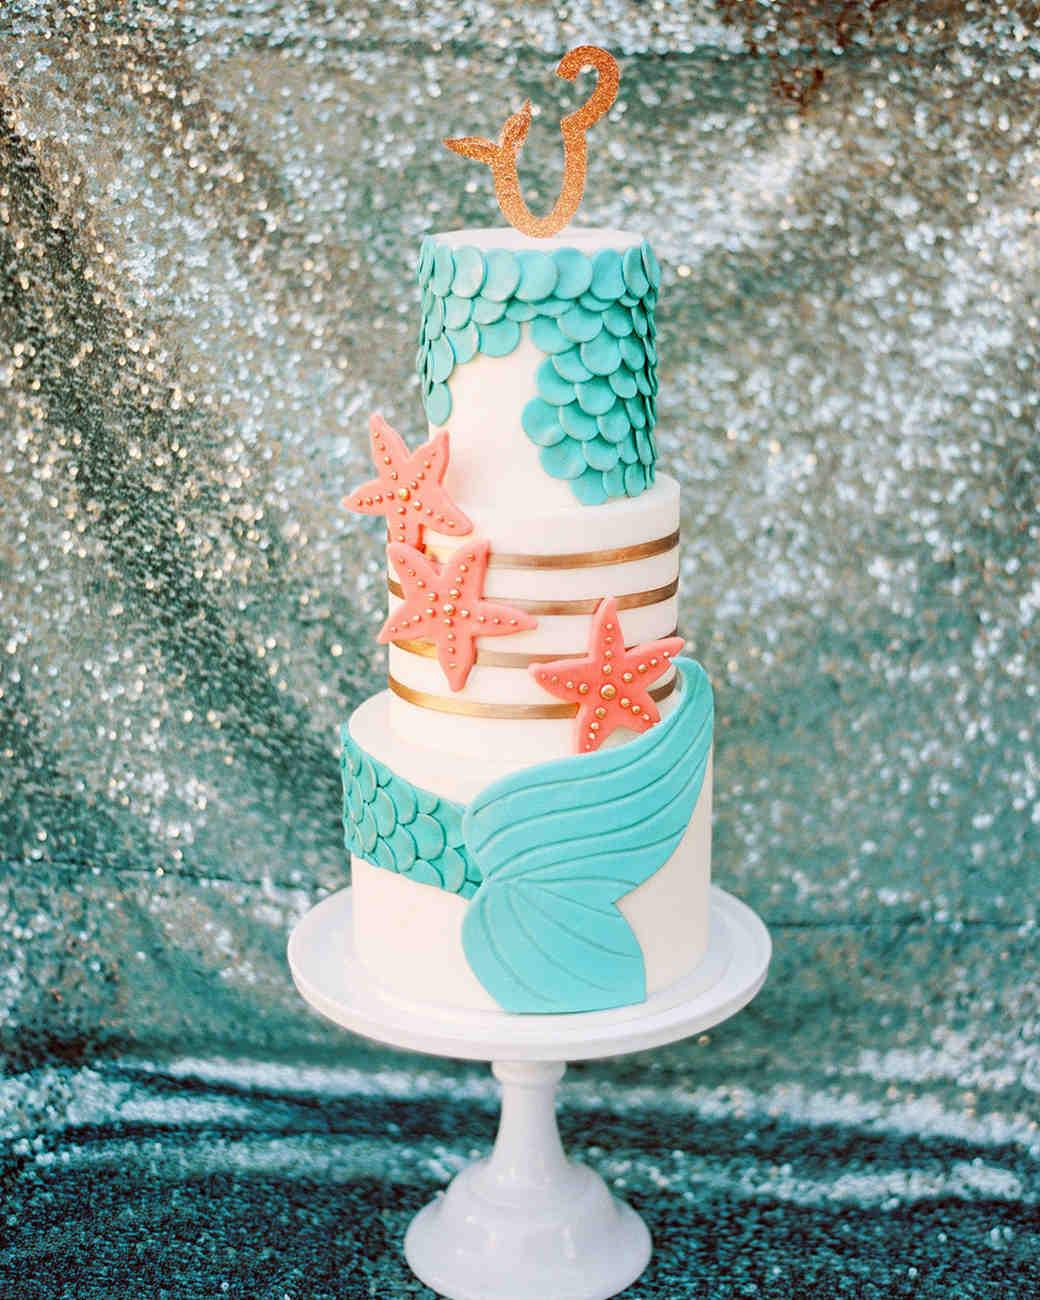 Mermaid-Inspired Wedding Cake